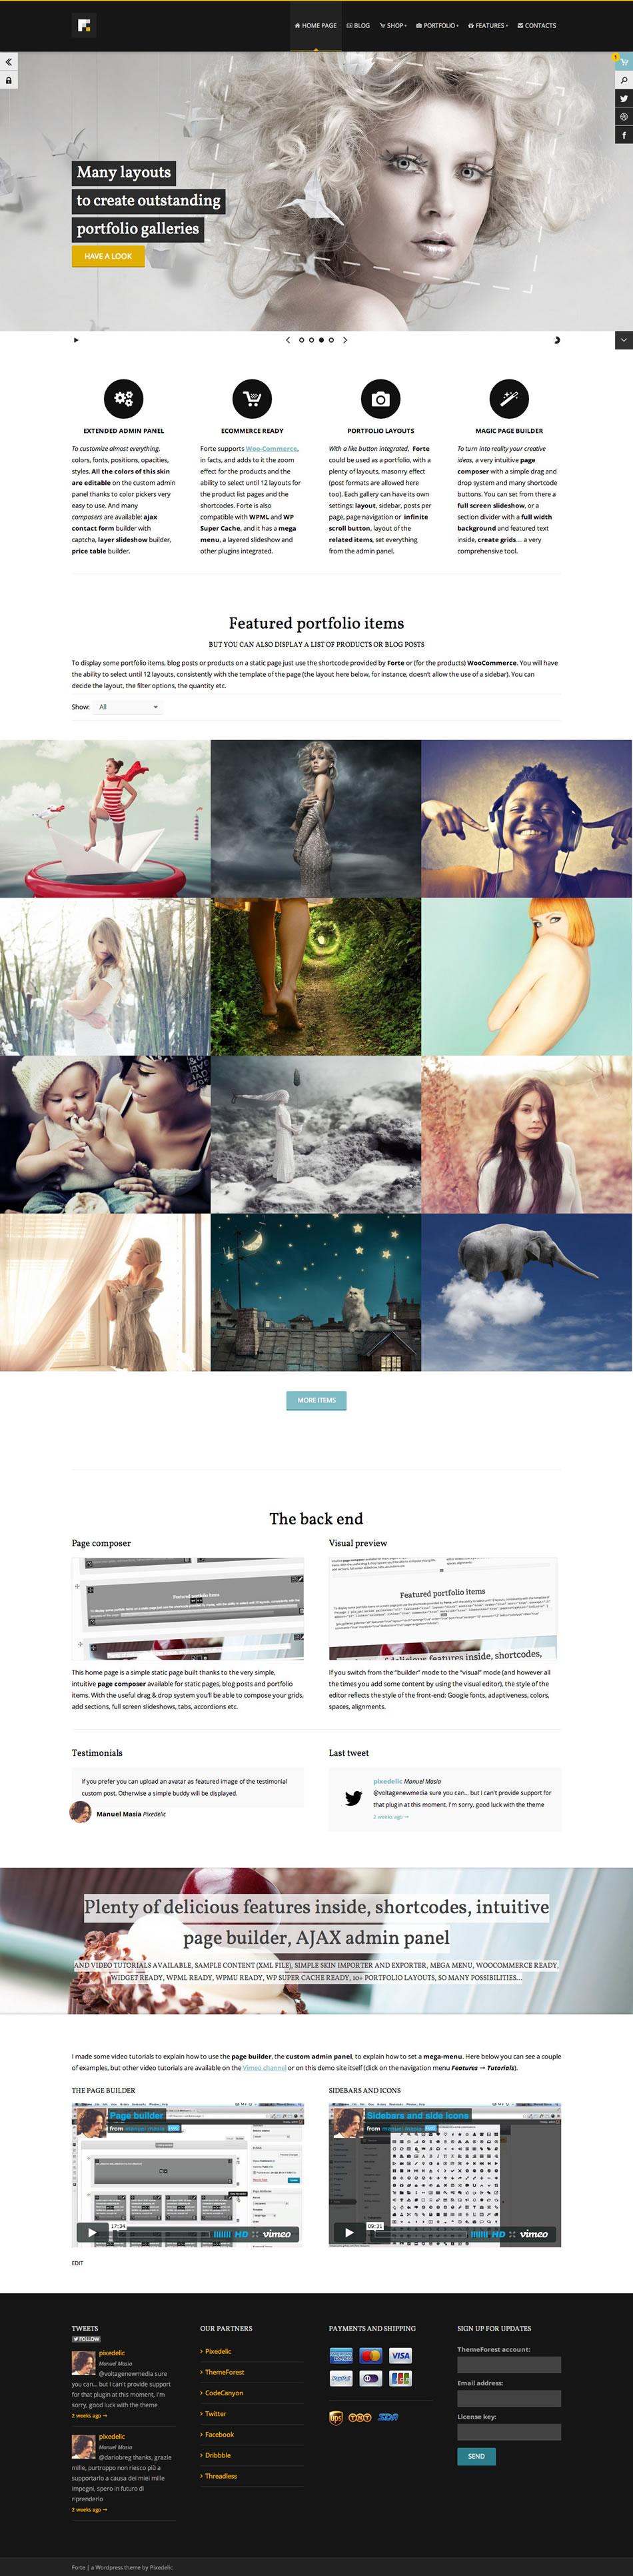 forte wordpress theme screenshot